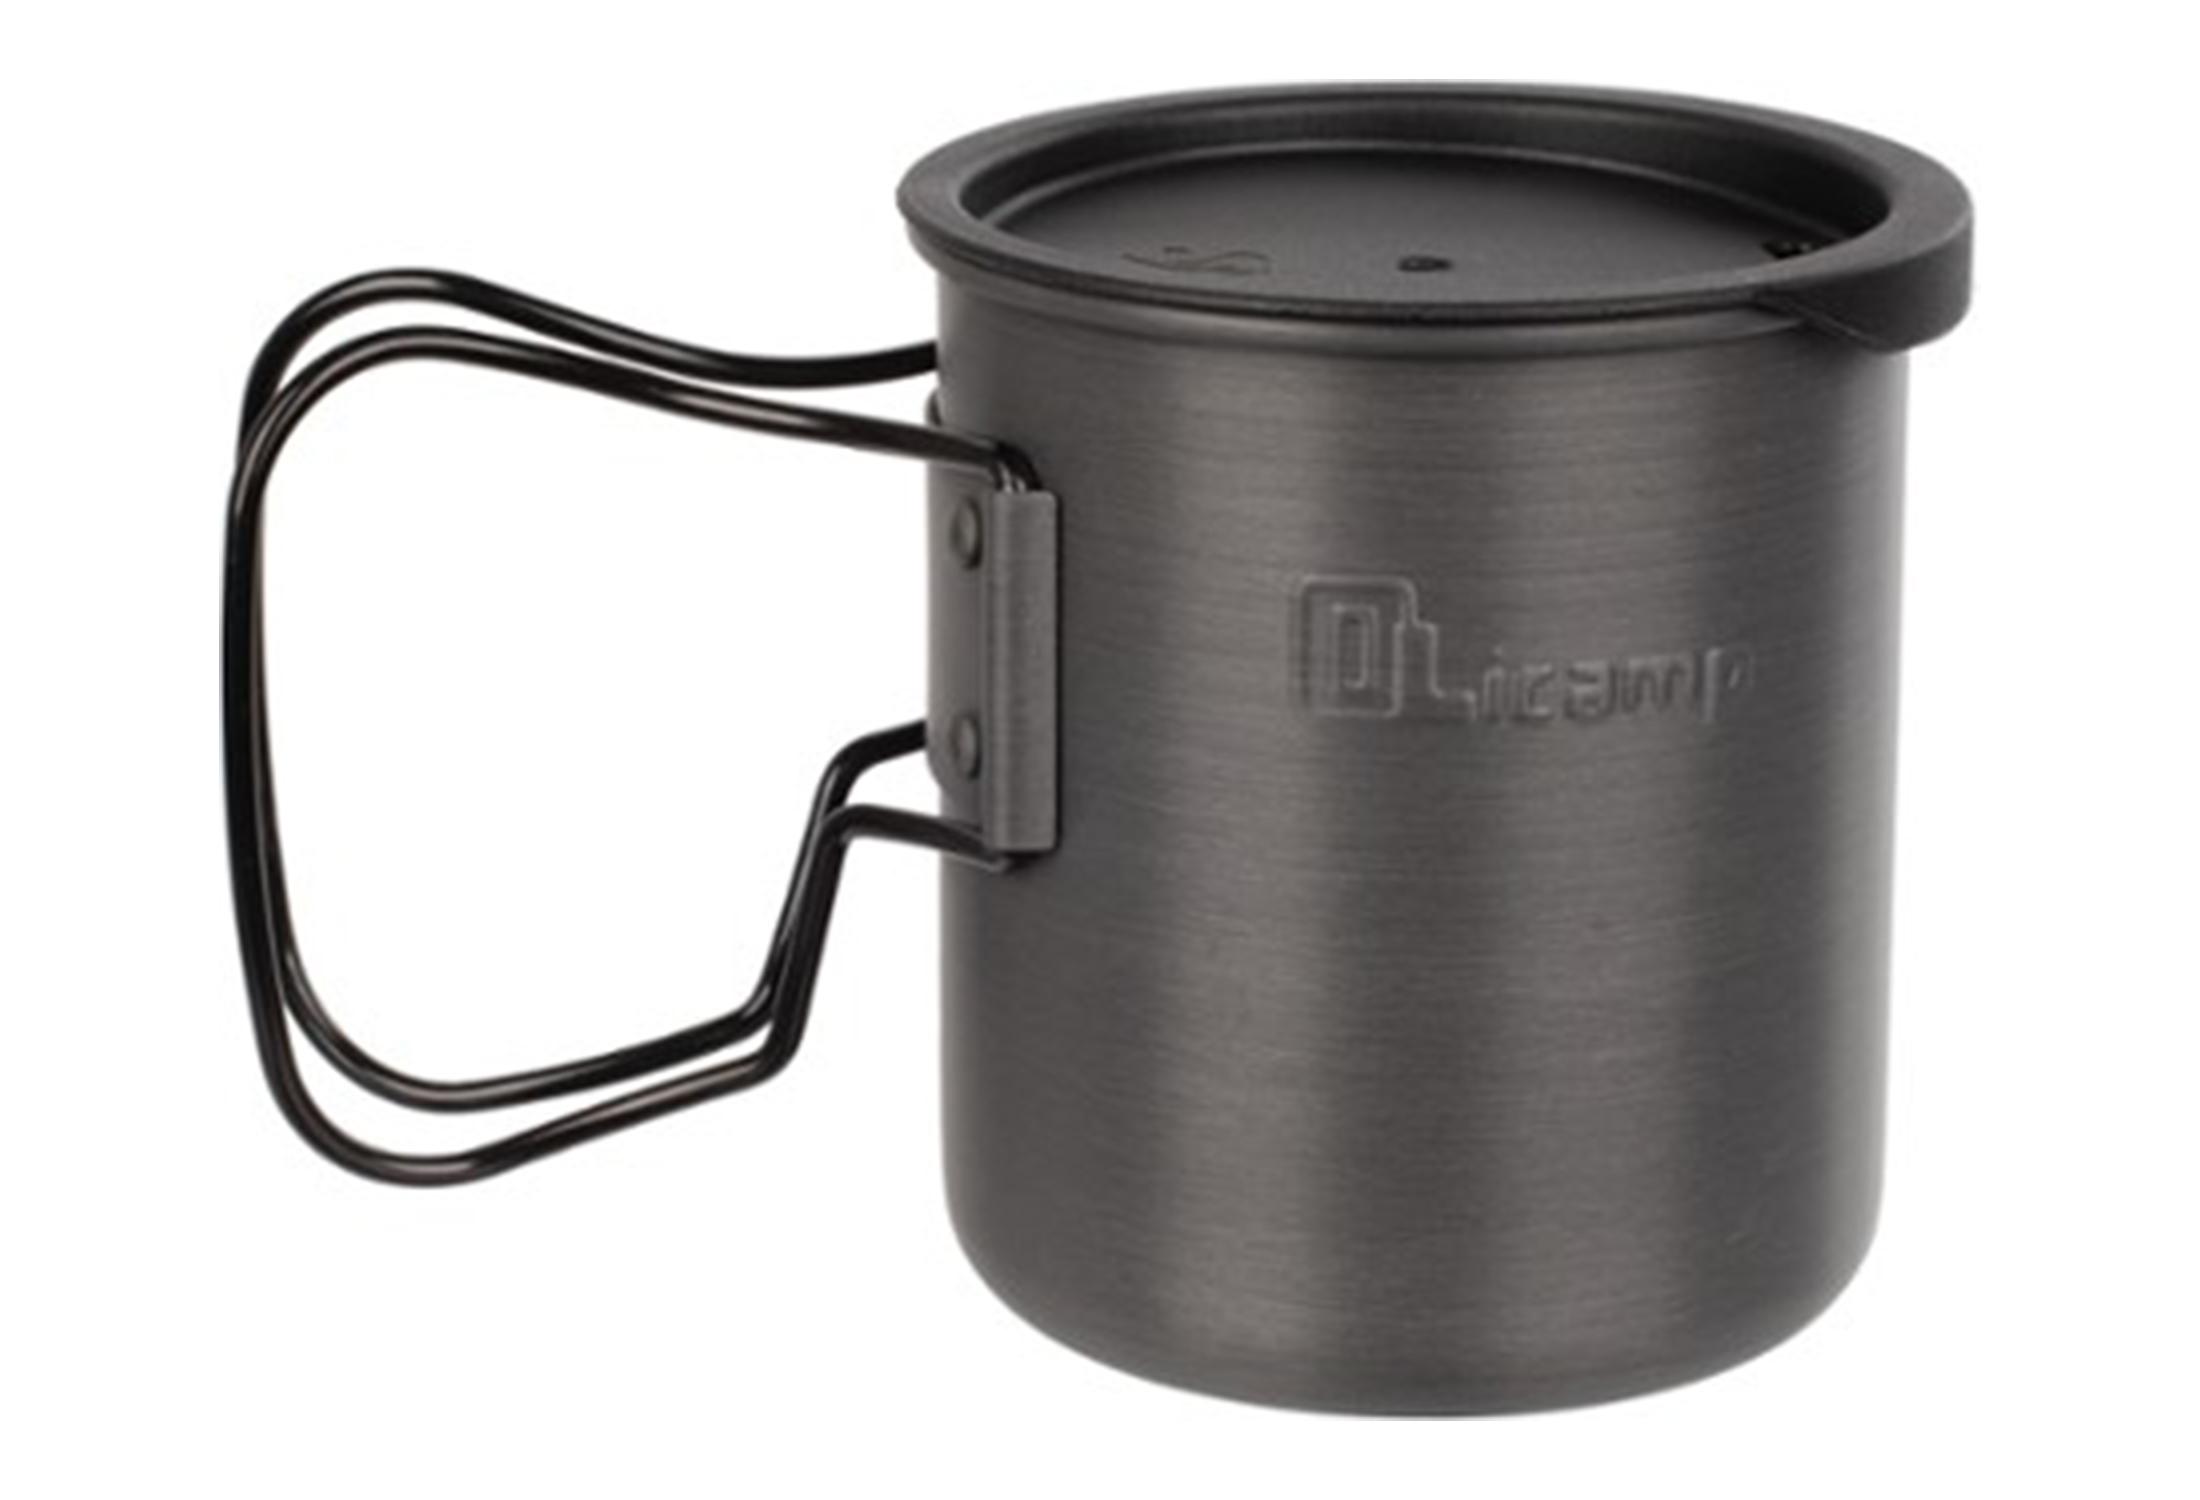 OliCamp mug with lid